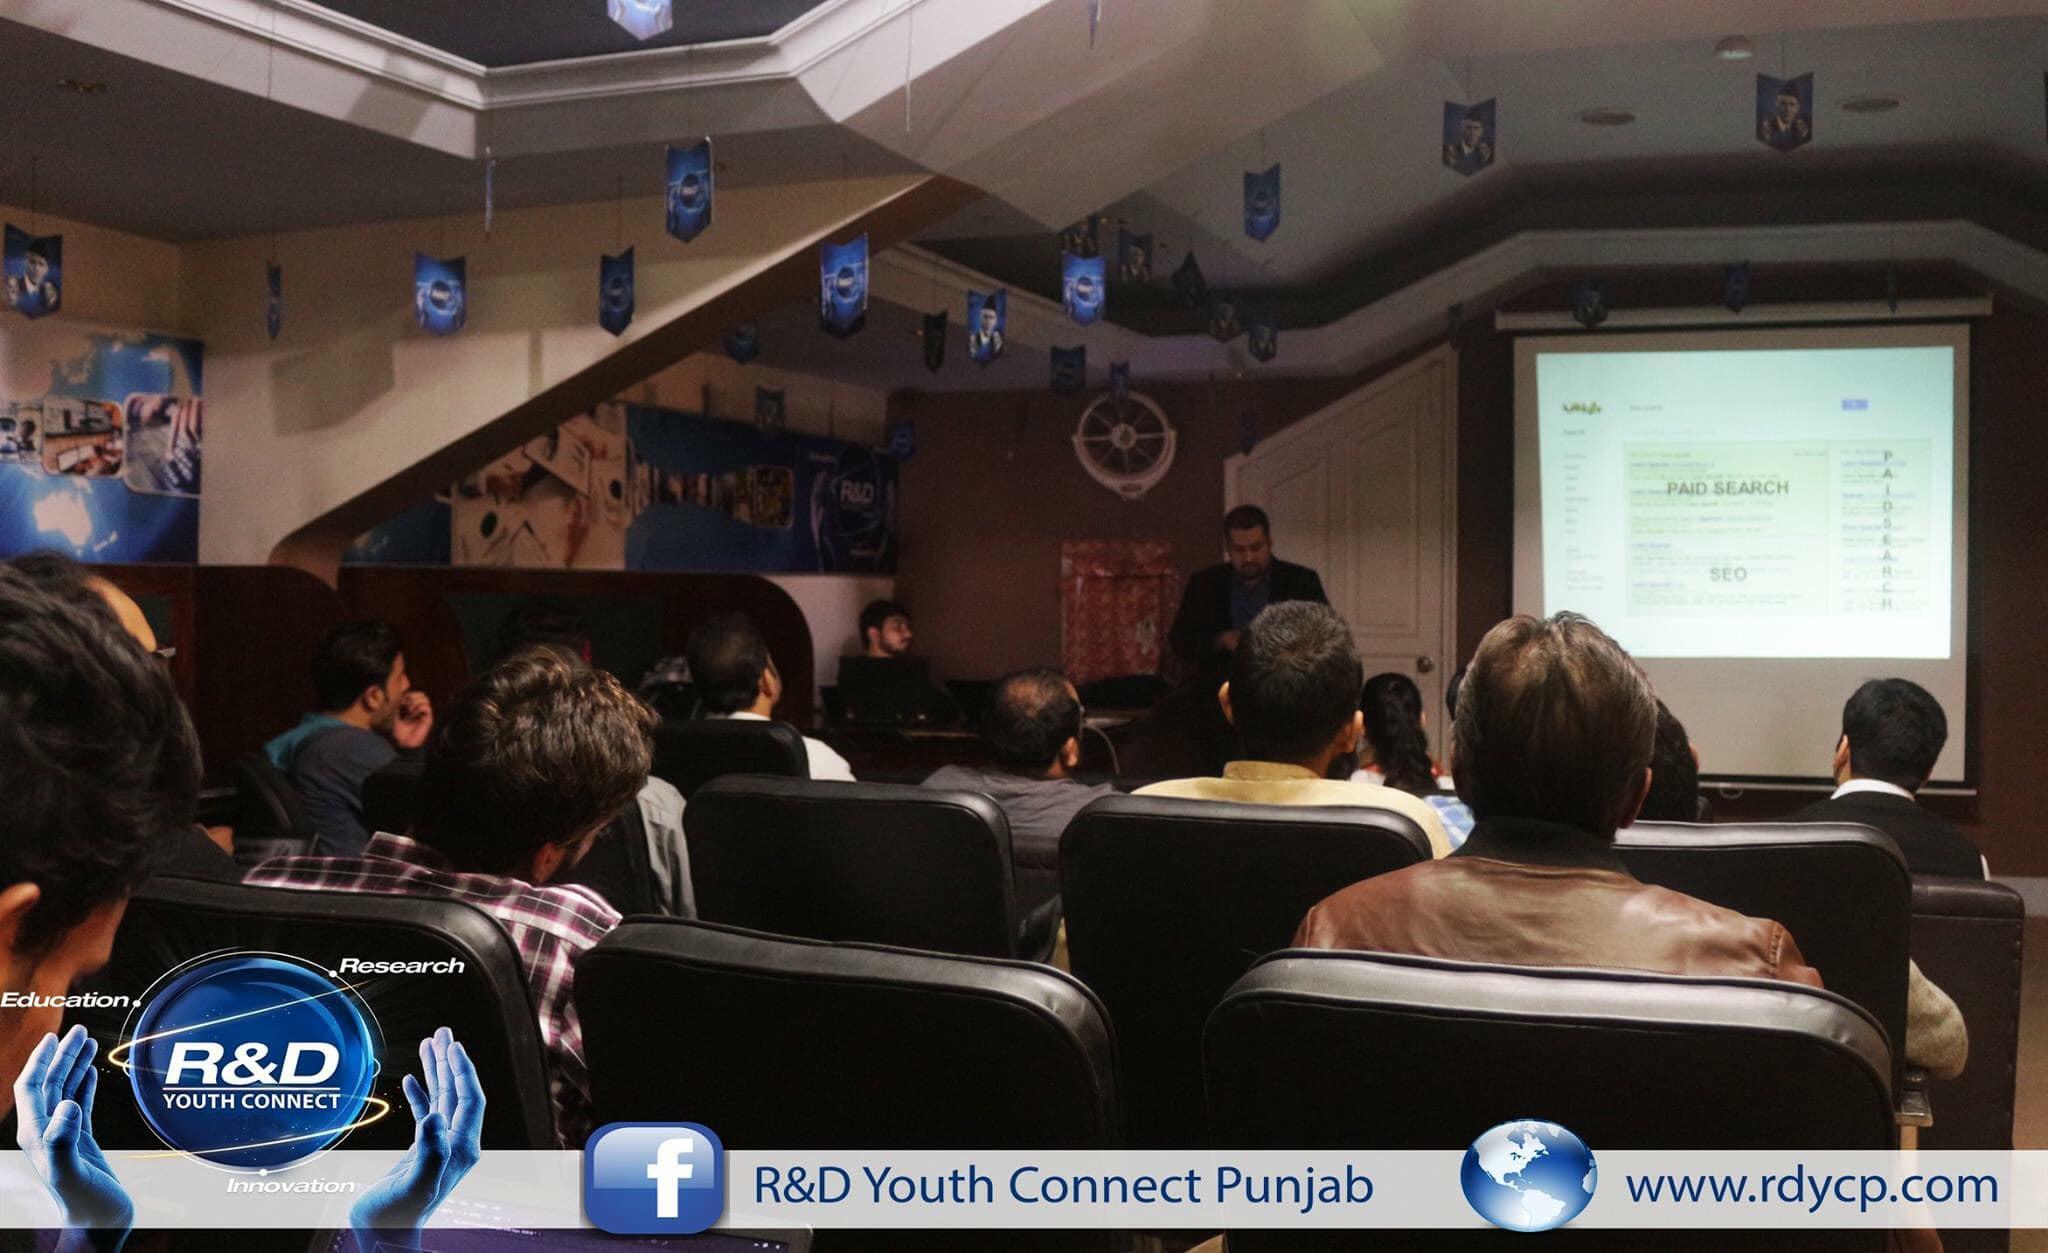 R & D Youth Connect Punjab Digital Marketing Growth Session Ali Raza